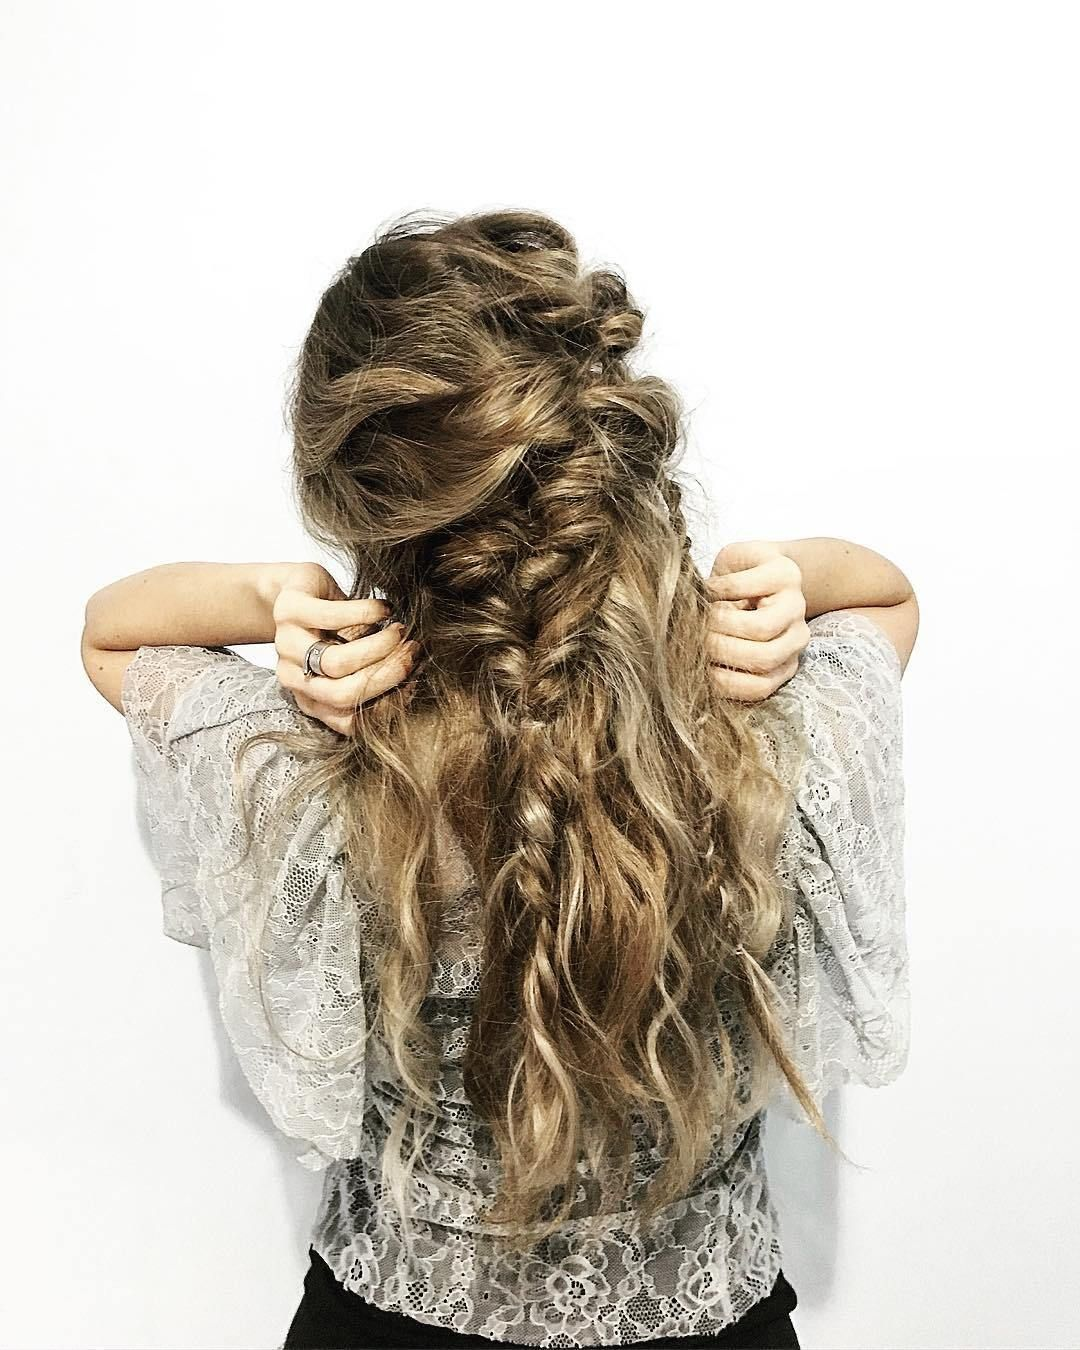 Creative messy braid half up half down hairstyle